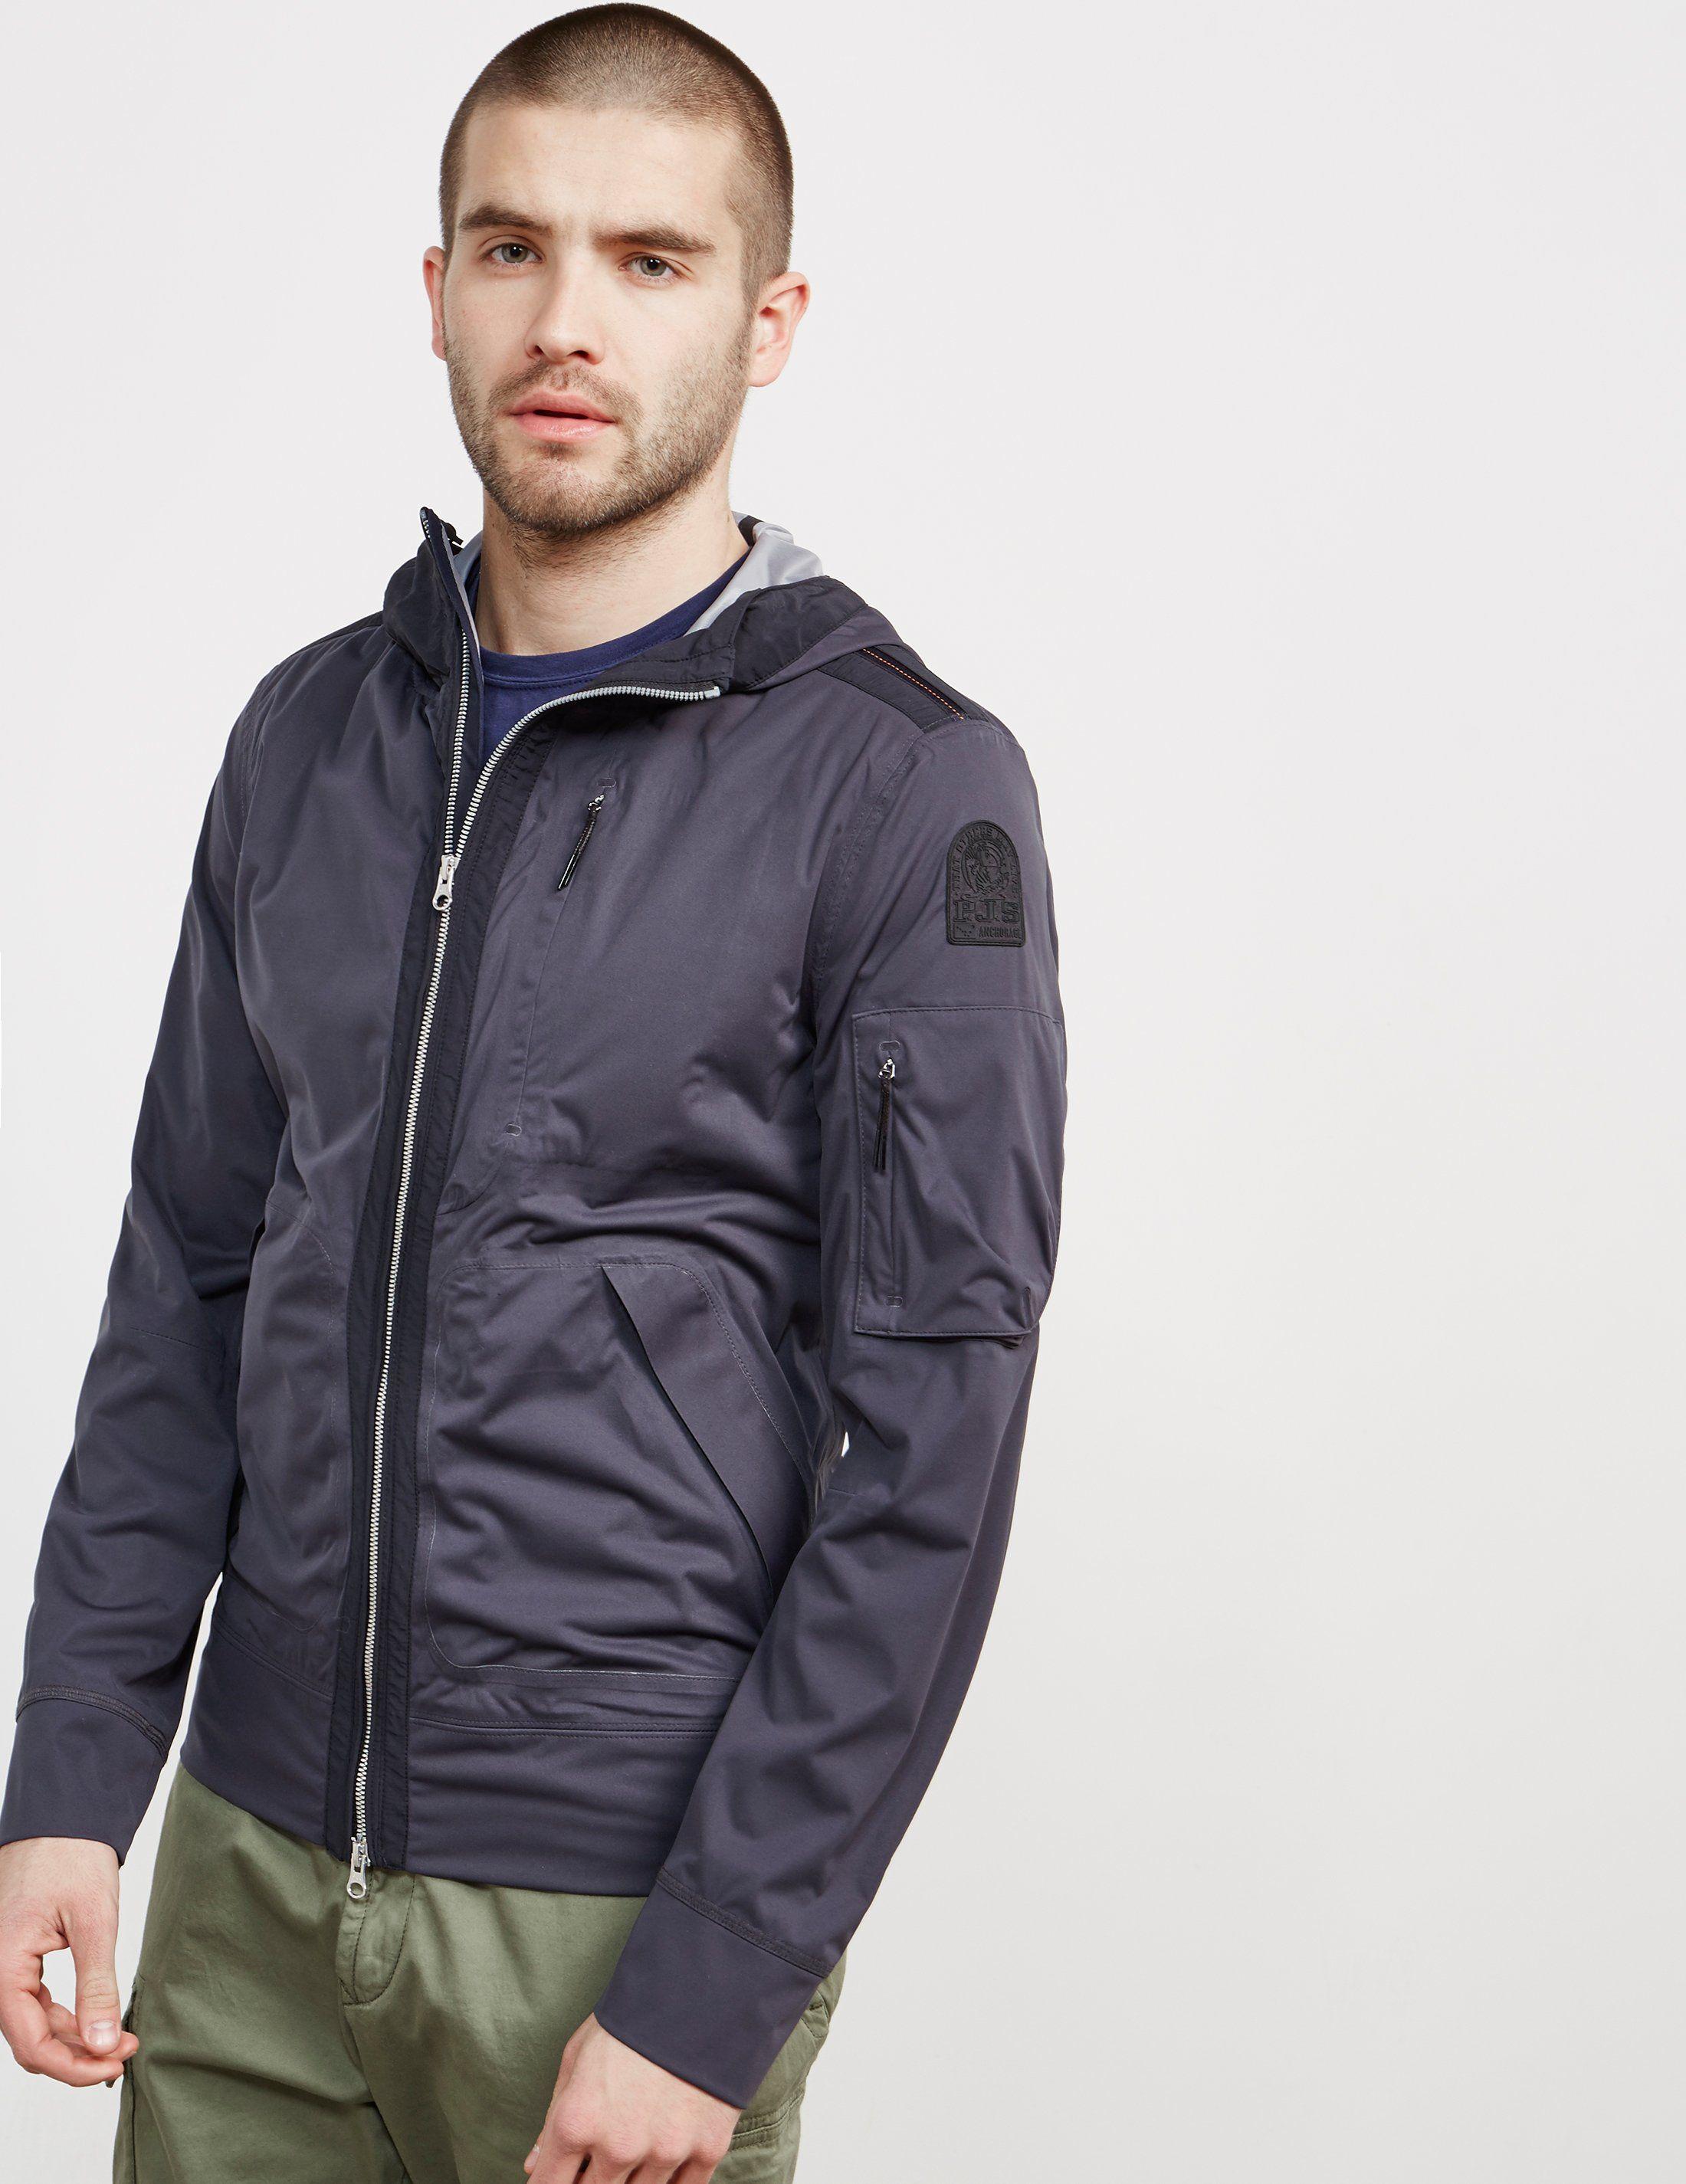 Parajumpers Yakumo Hooded Jacket - Online Exclusive